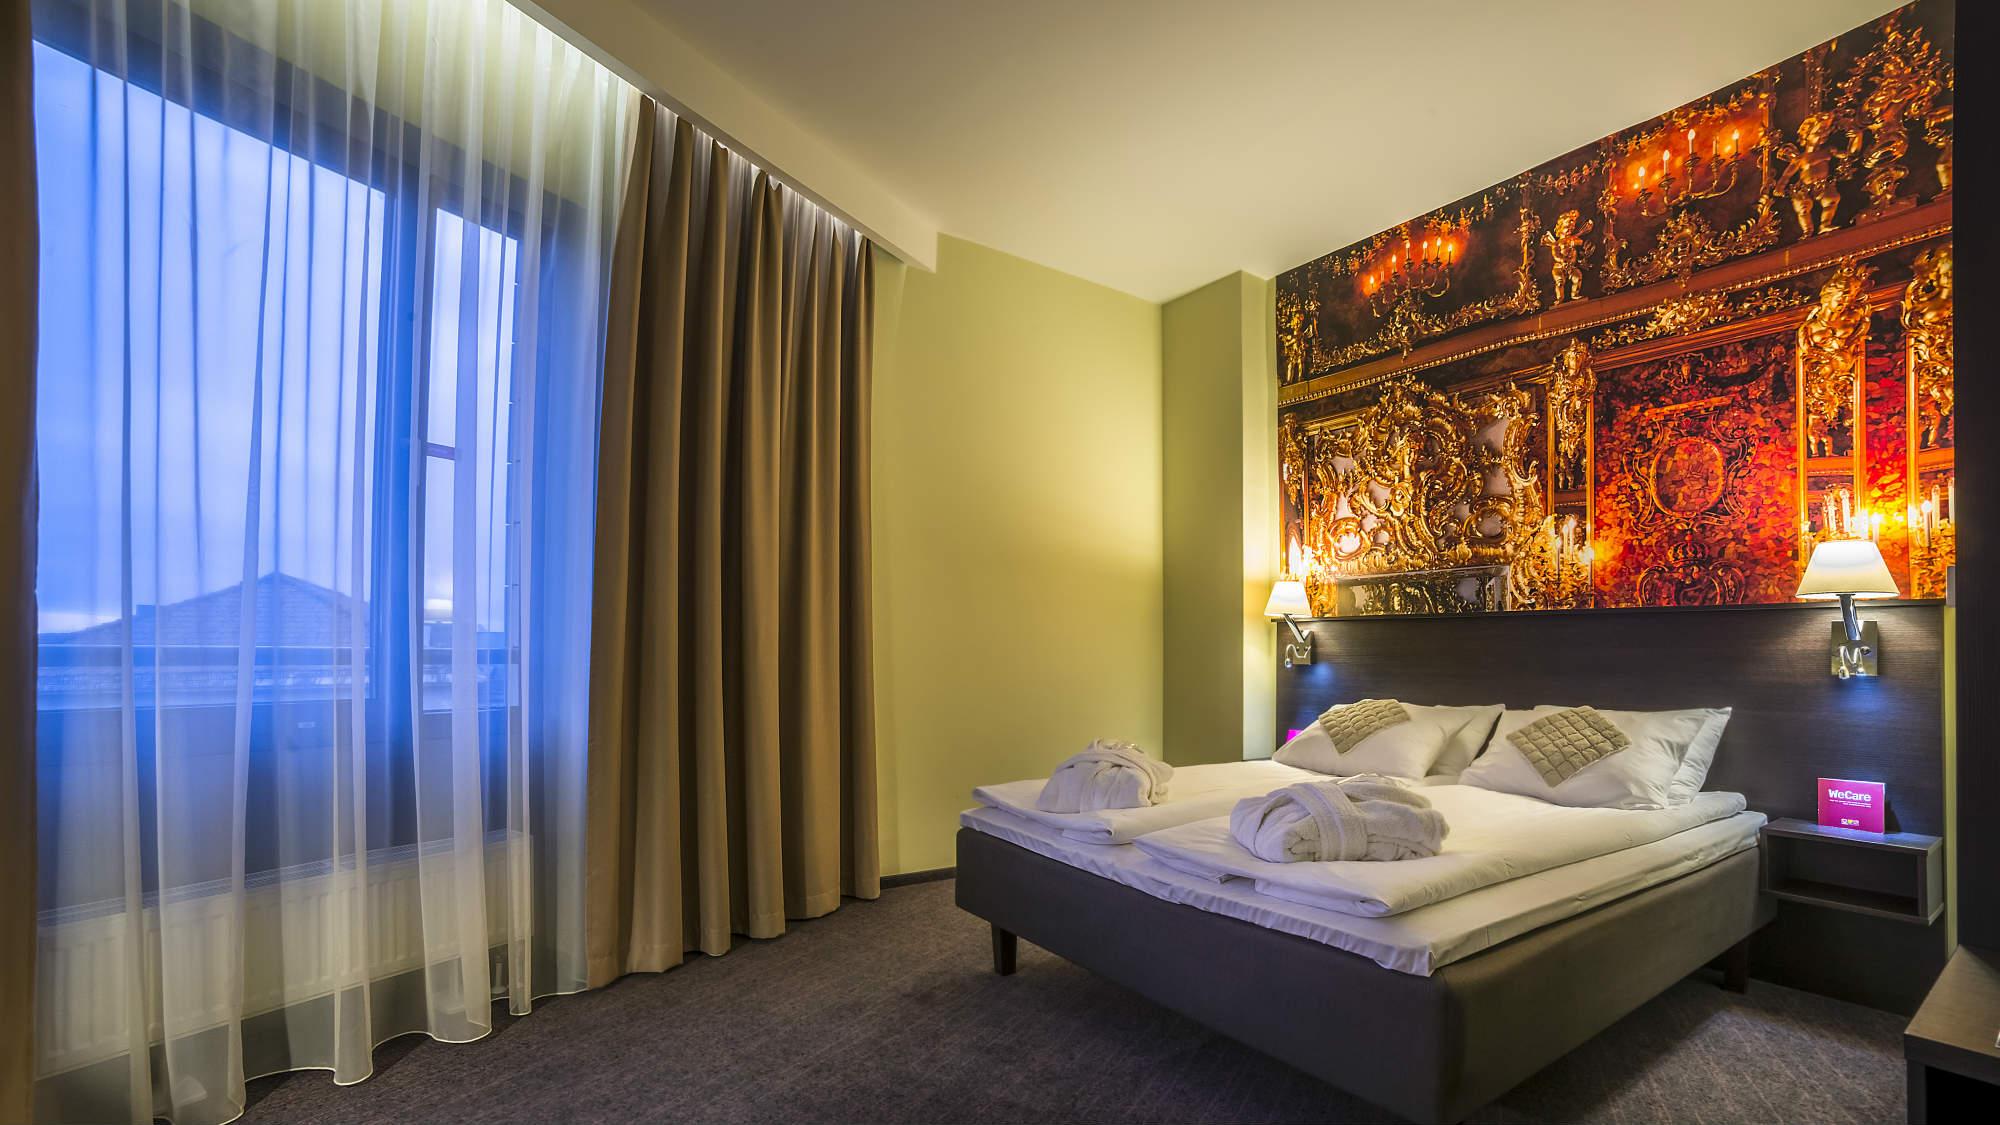 Фото отеля Comfort Hotel® LT № 16